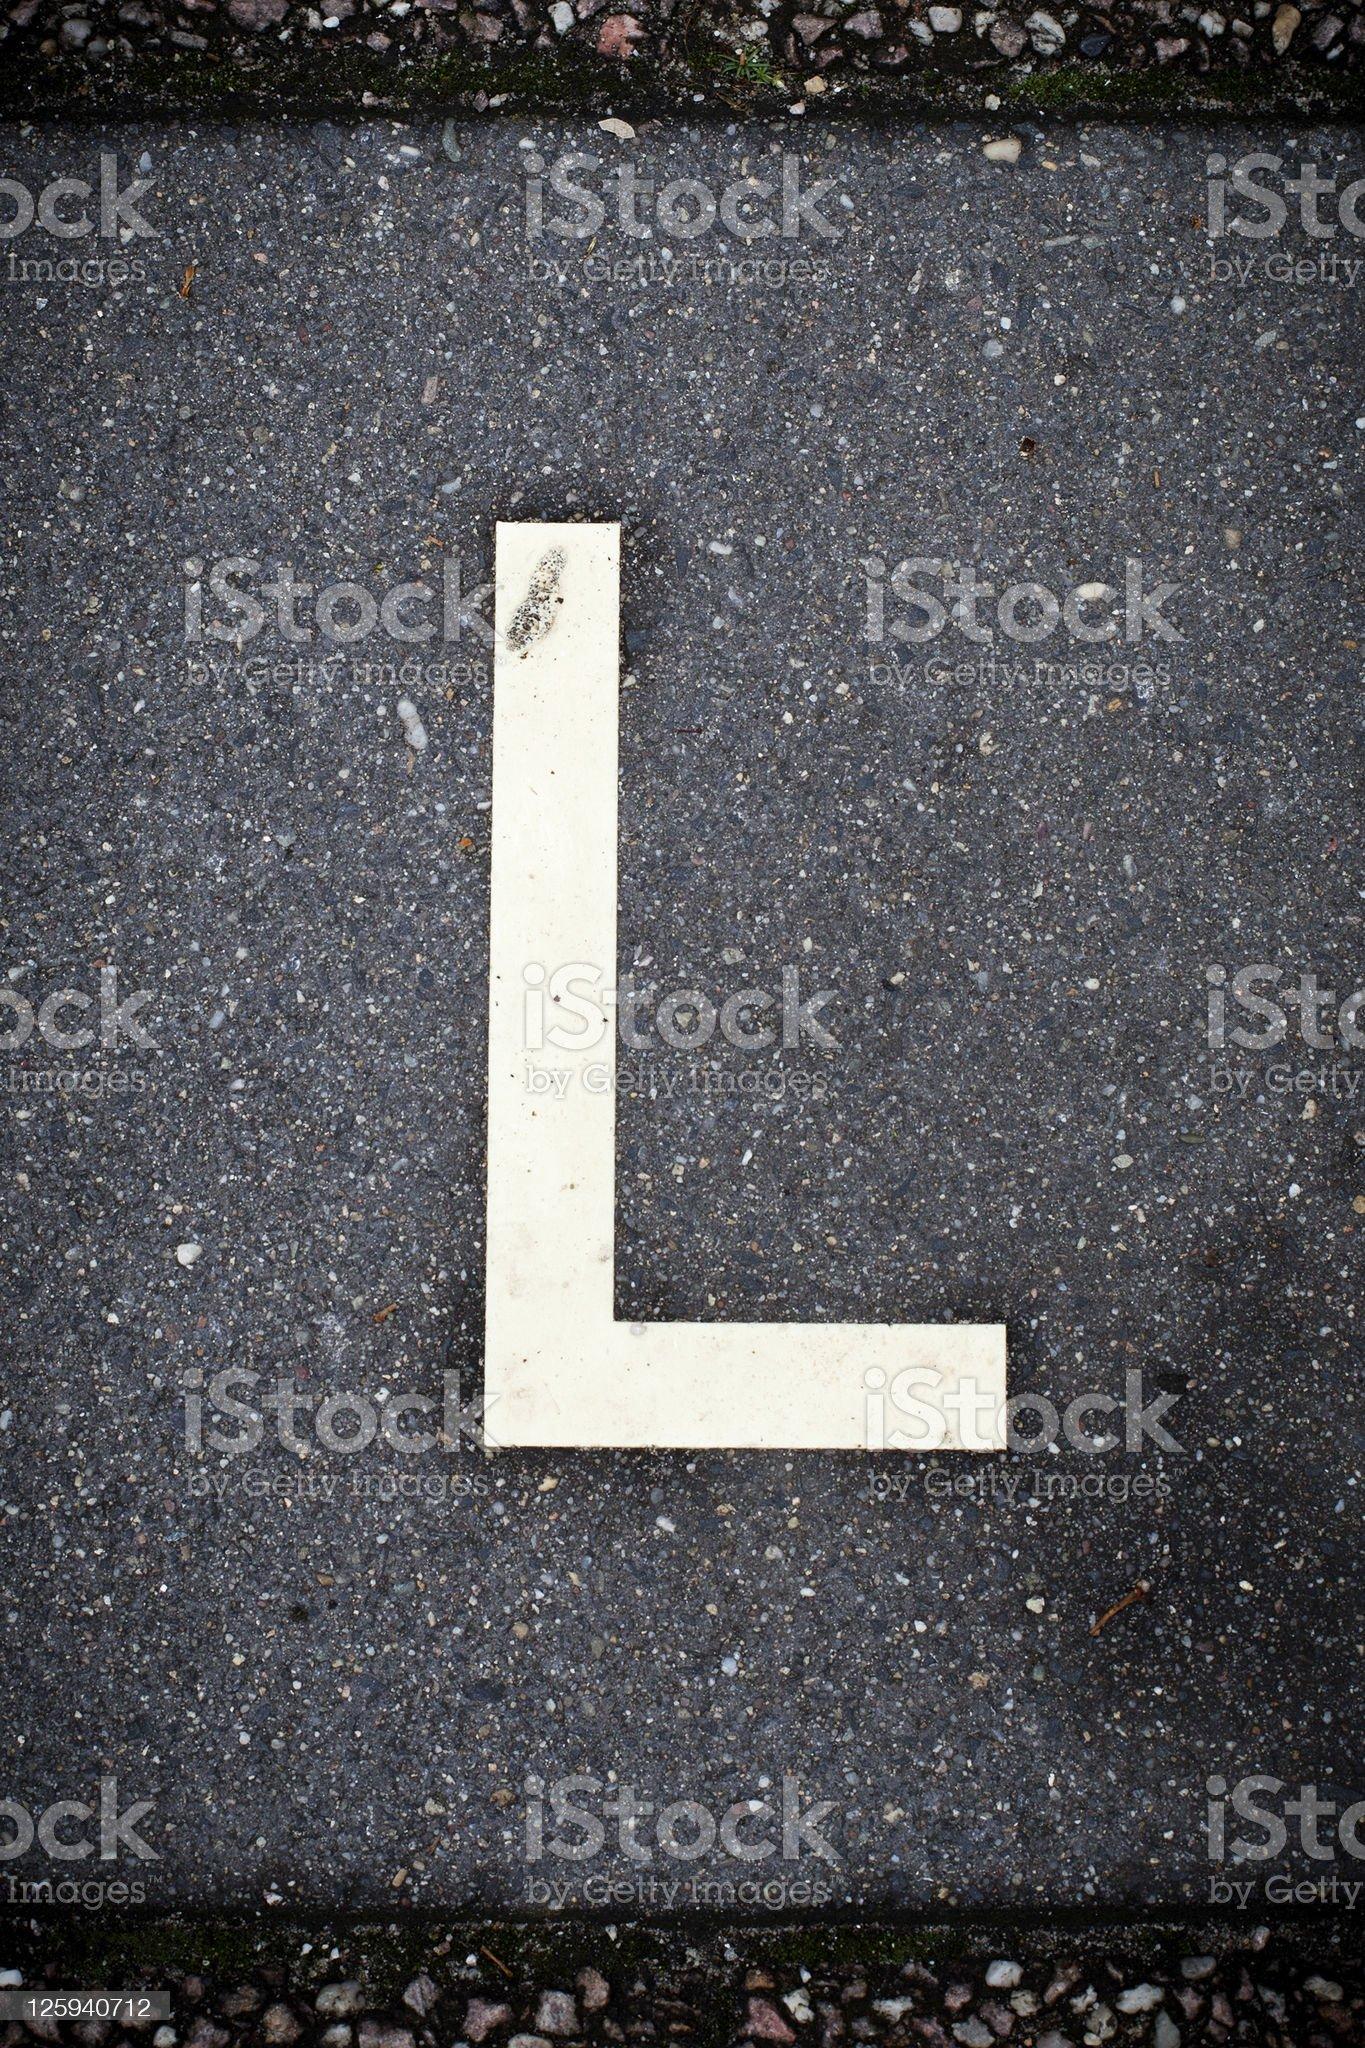 White Letter  L on the Road Asphalt. royalty-free stock photo